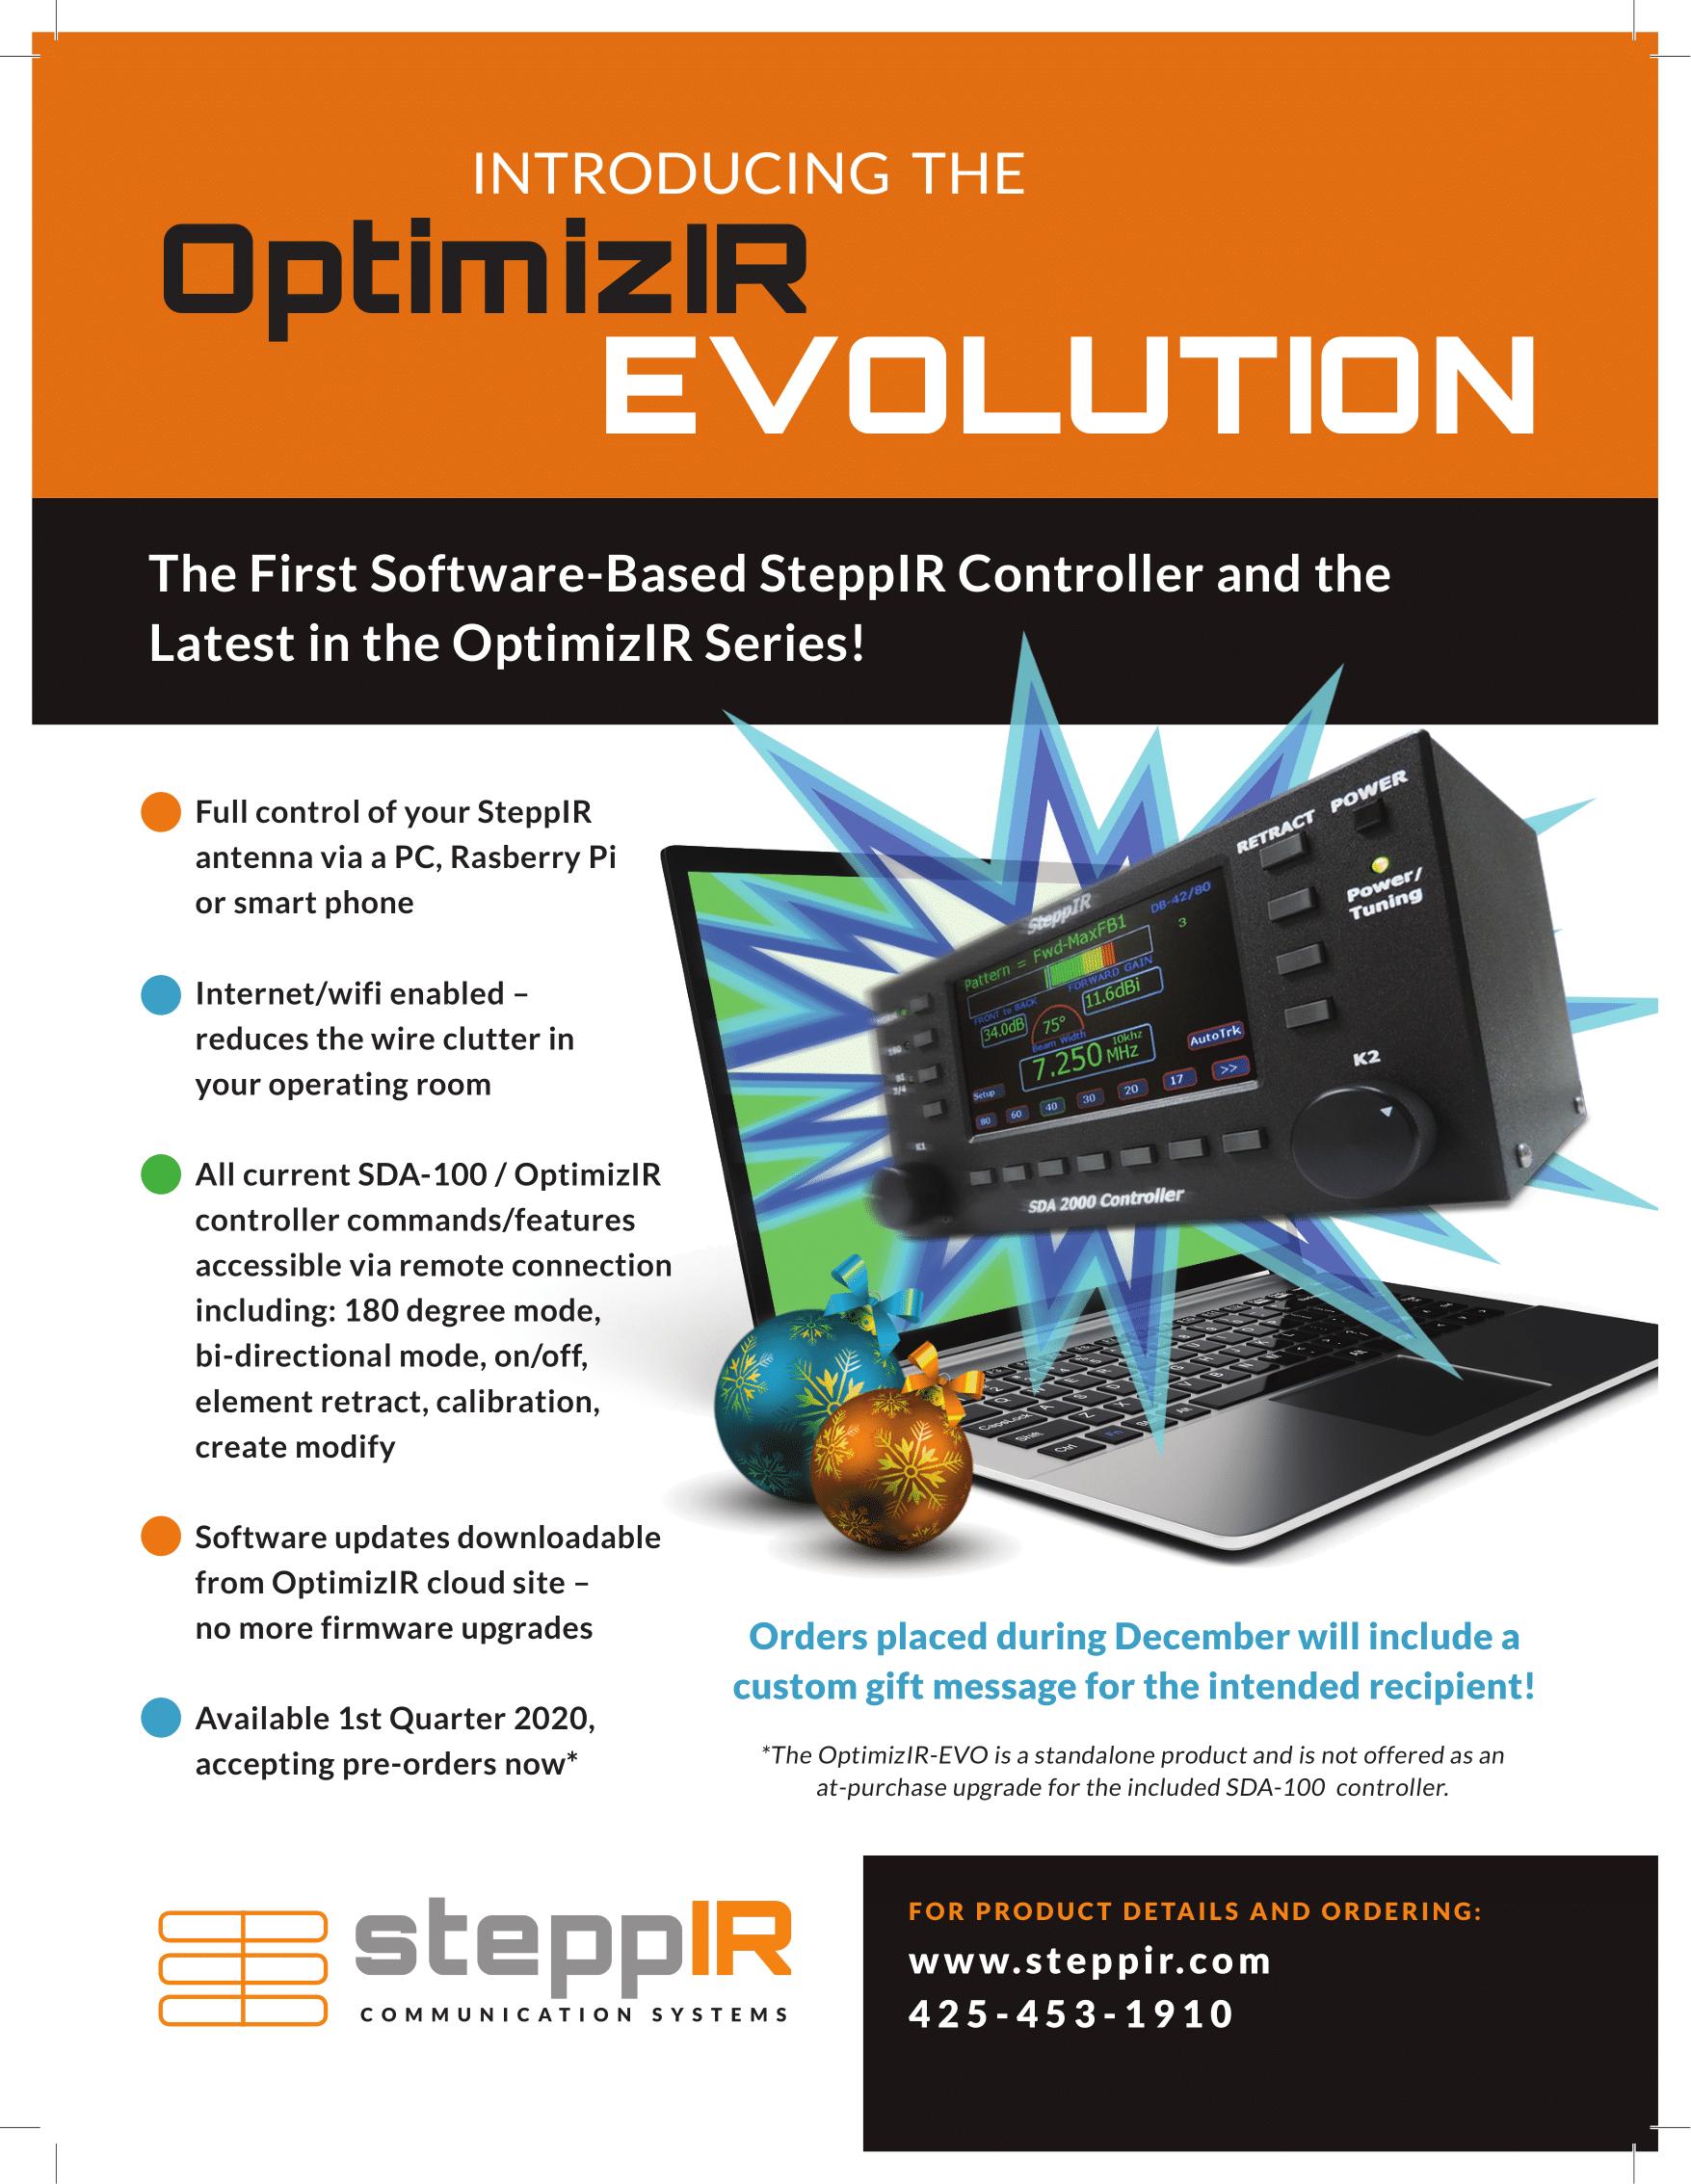 Introducing the OptimizIR Evolution!